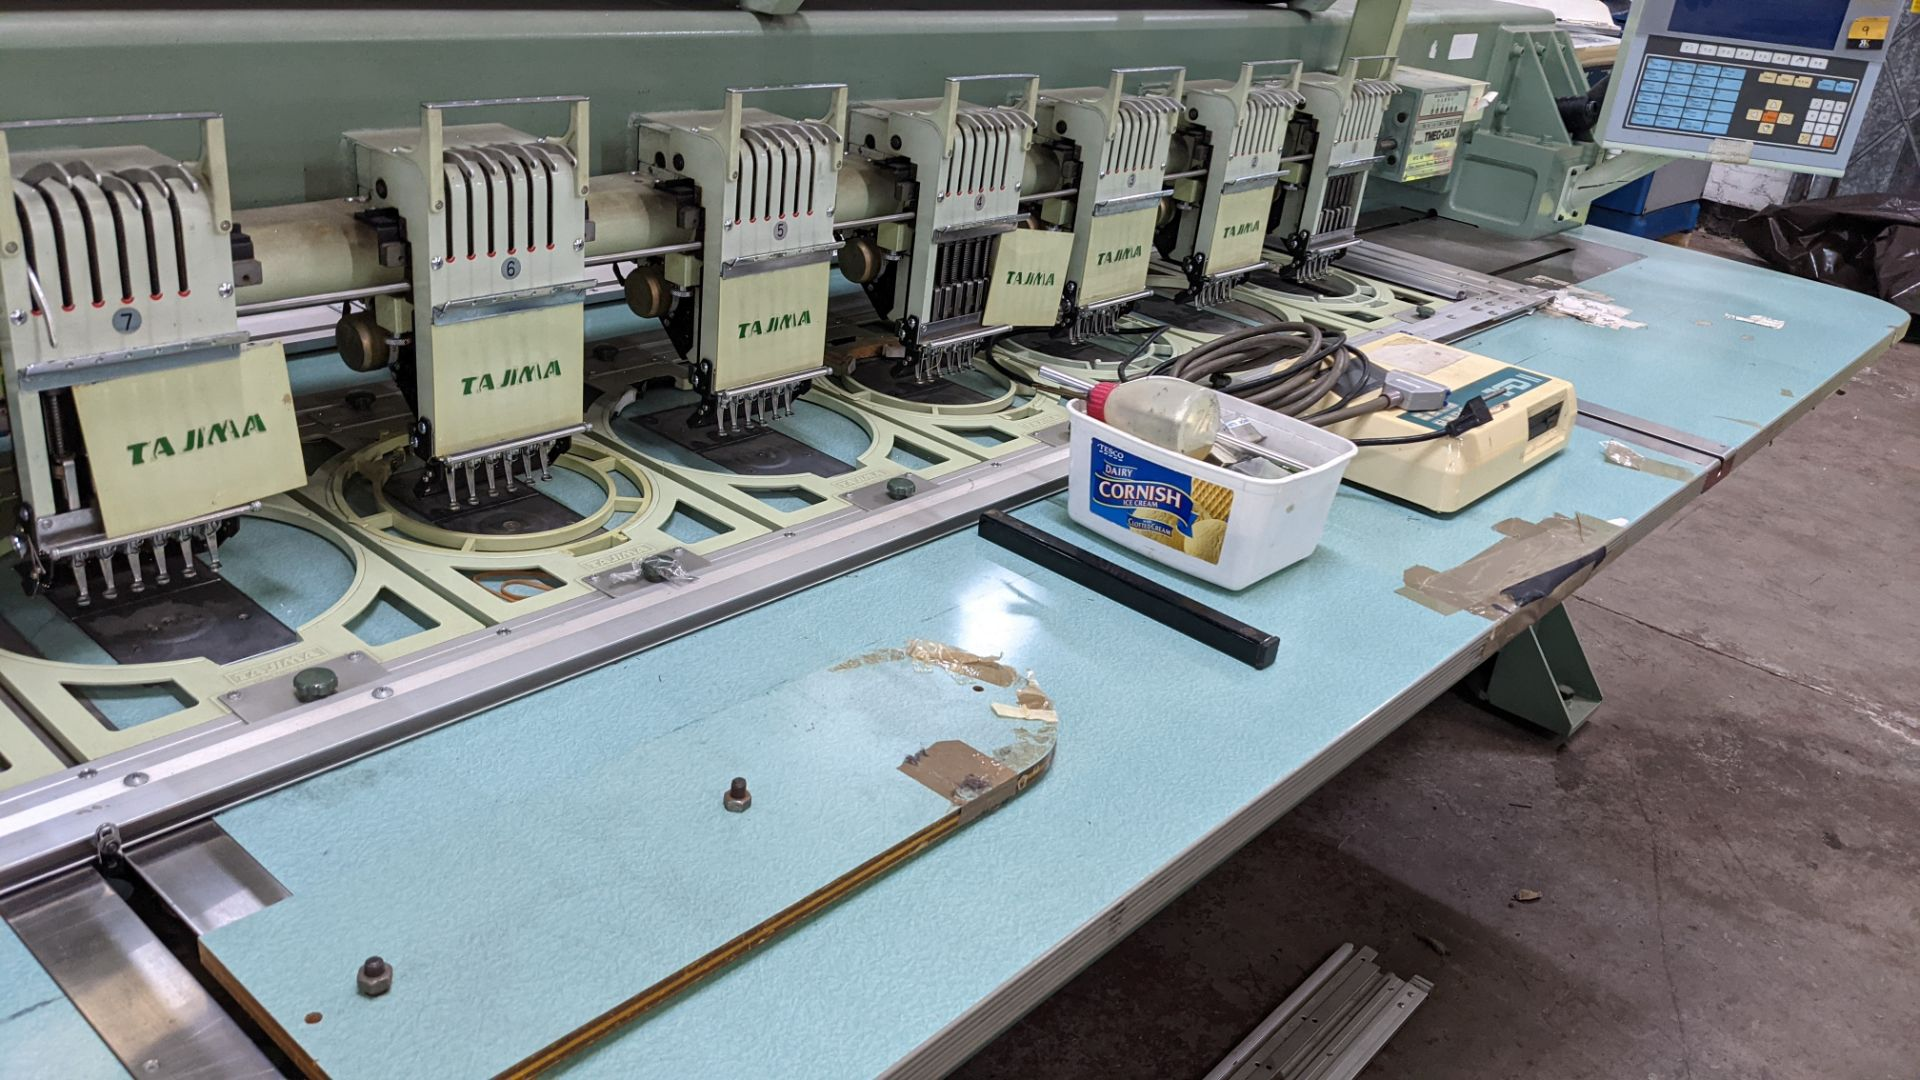 Tokai Tajima electronic 20 head automatic embroidery machine model TMEG-G620, manufacturing number 7 - Image 14 of 19